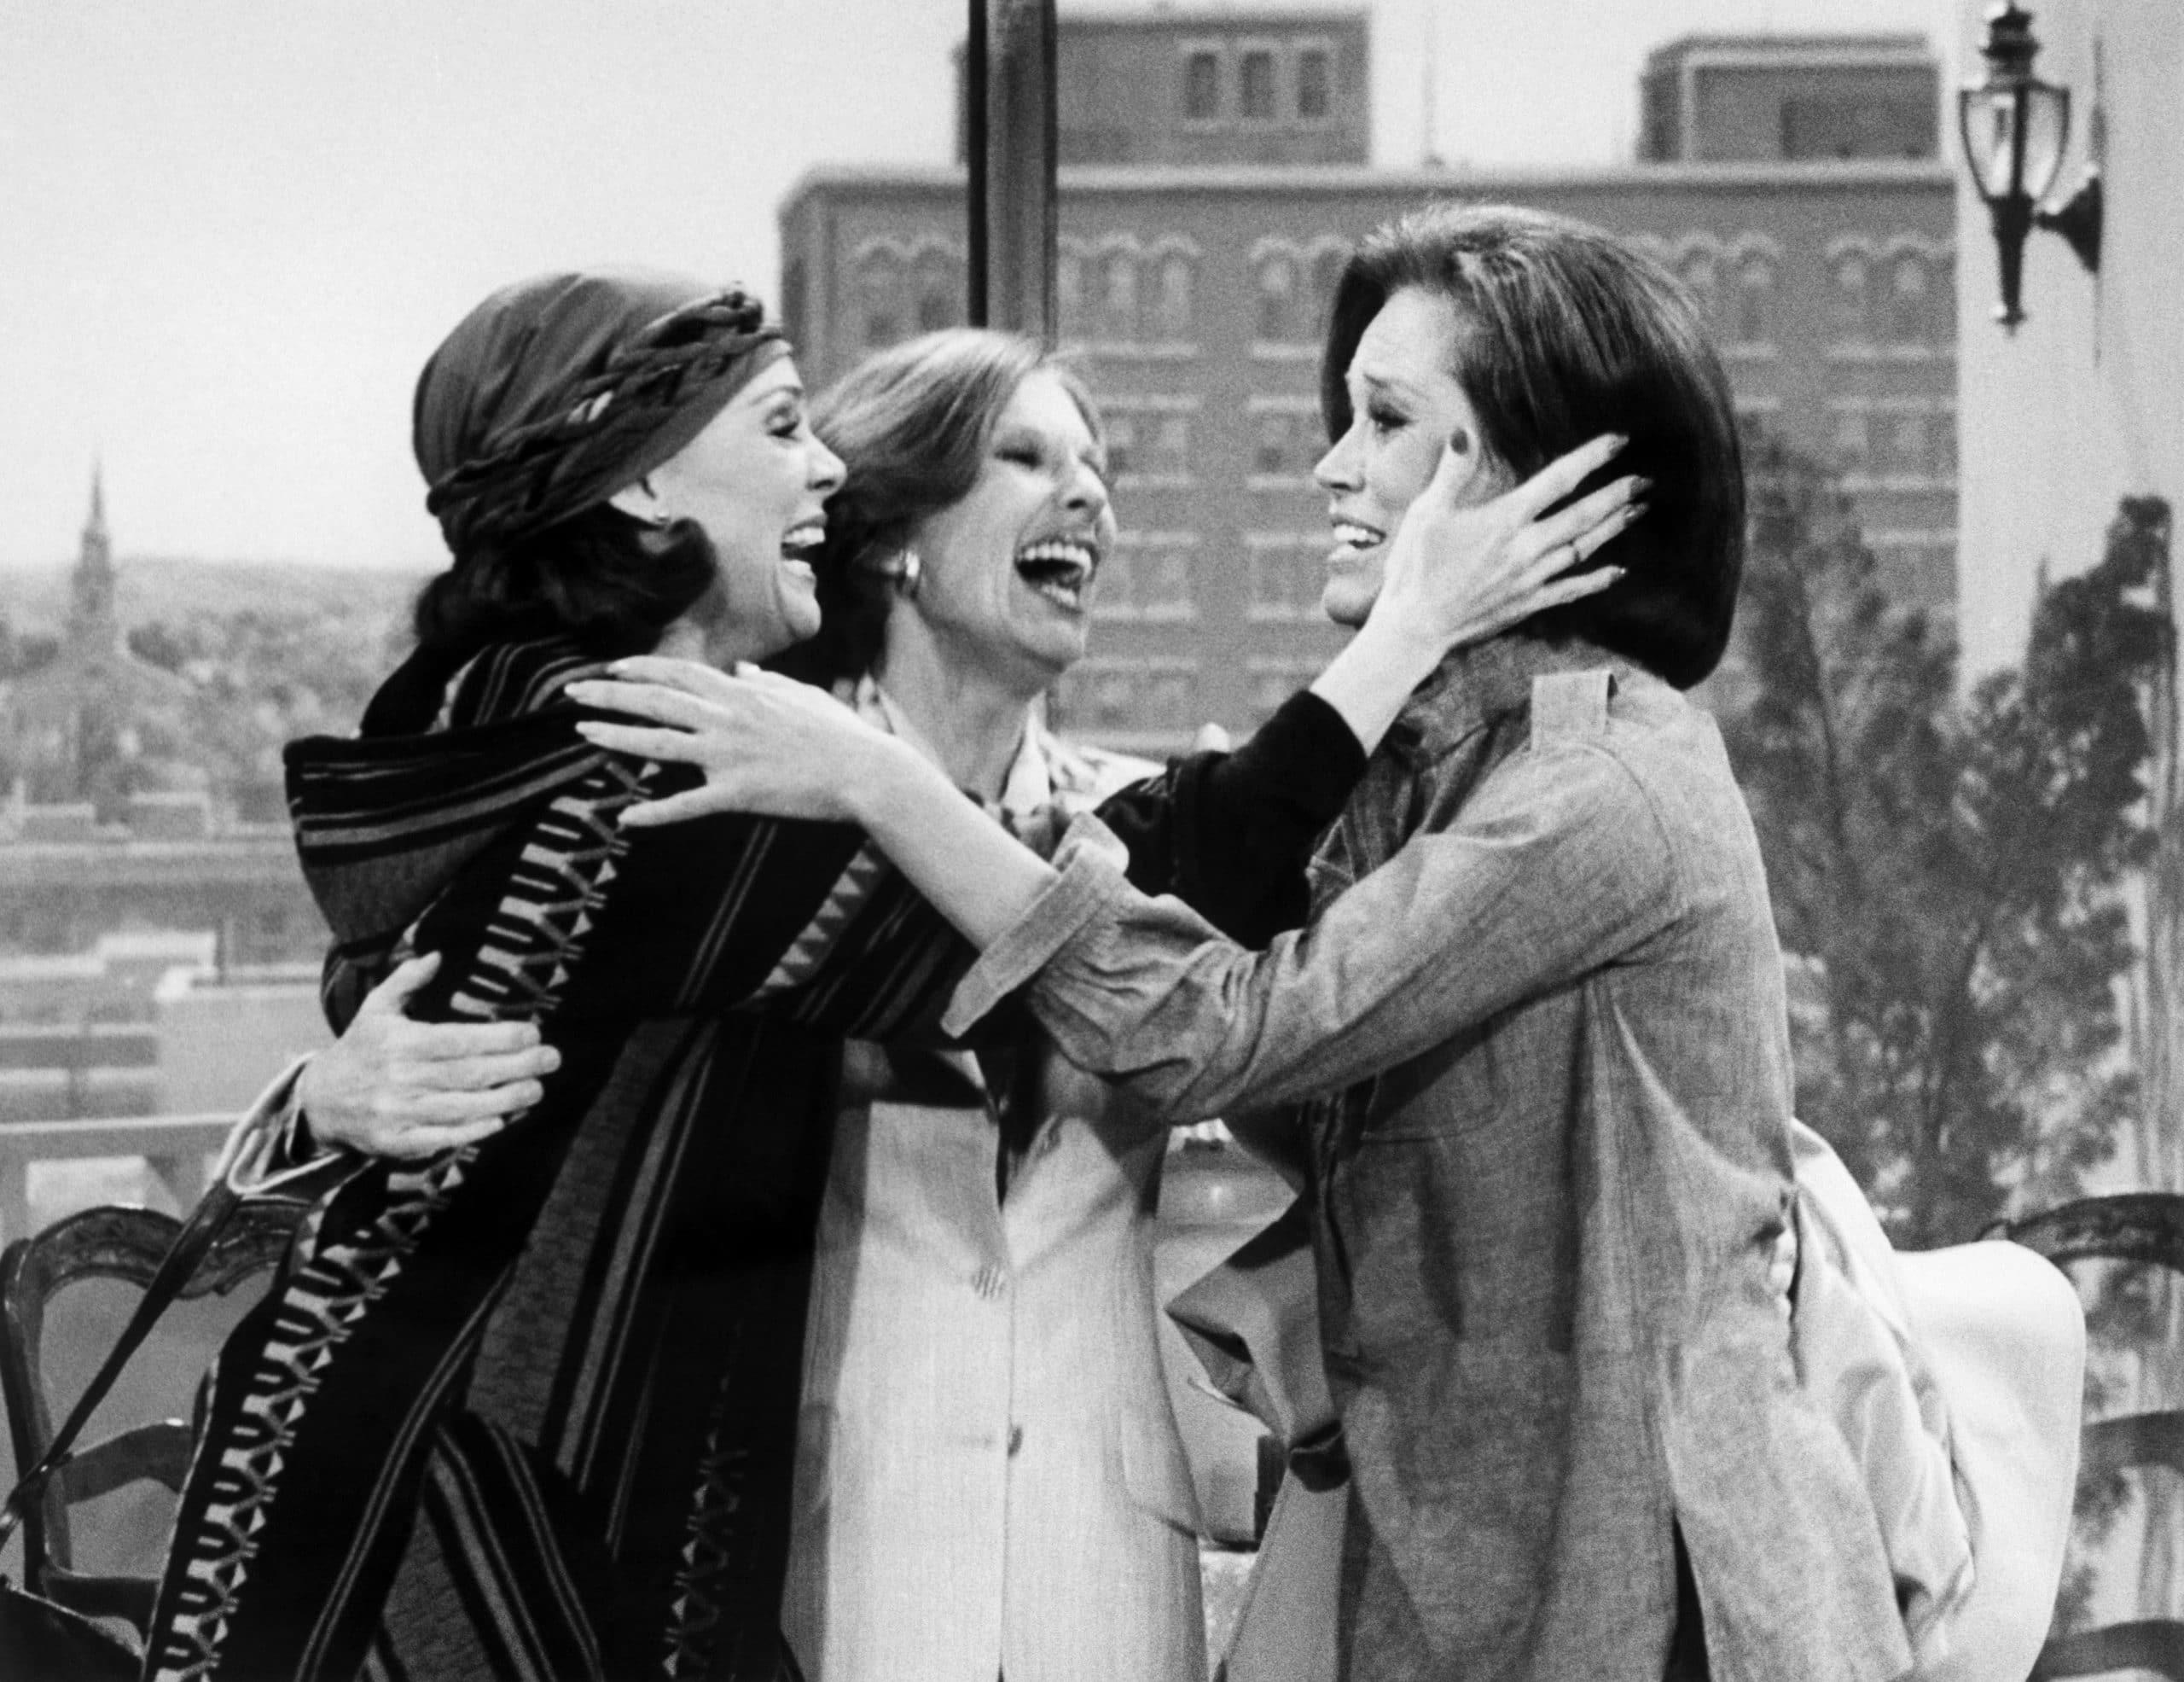 Looking Back On Emotional Reunion Between Cloris Leachman & 'Mary Tyler Moore' Co-Stars